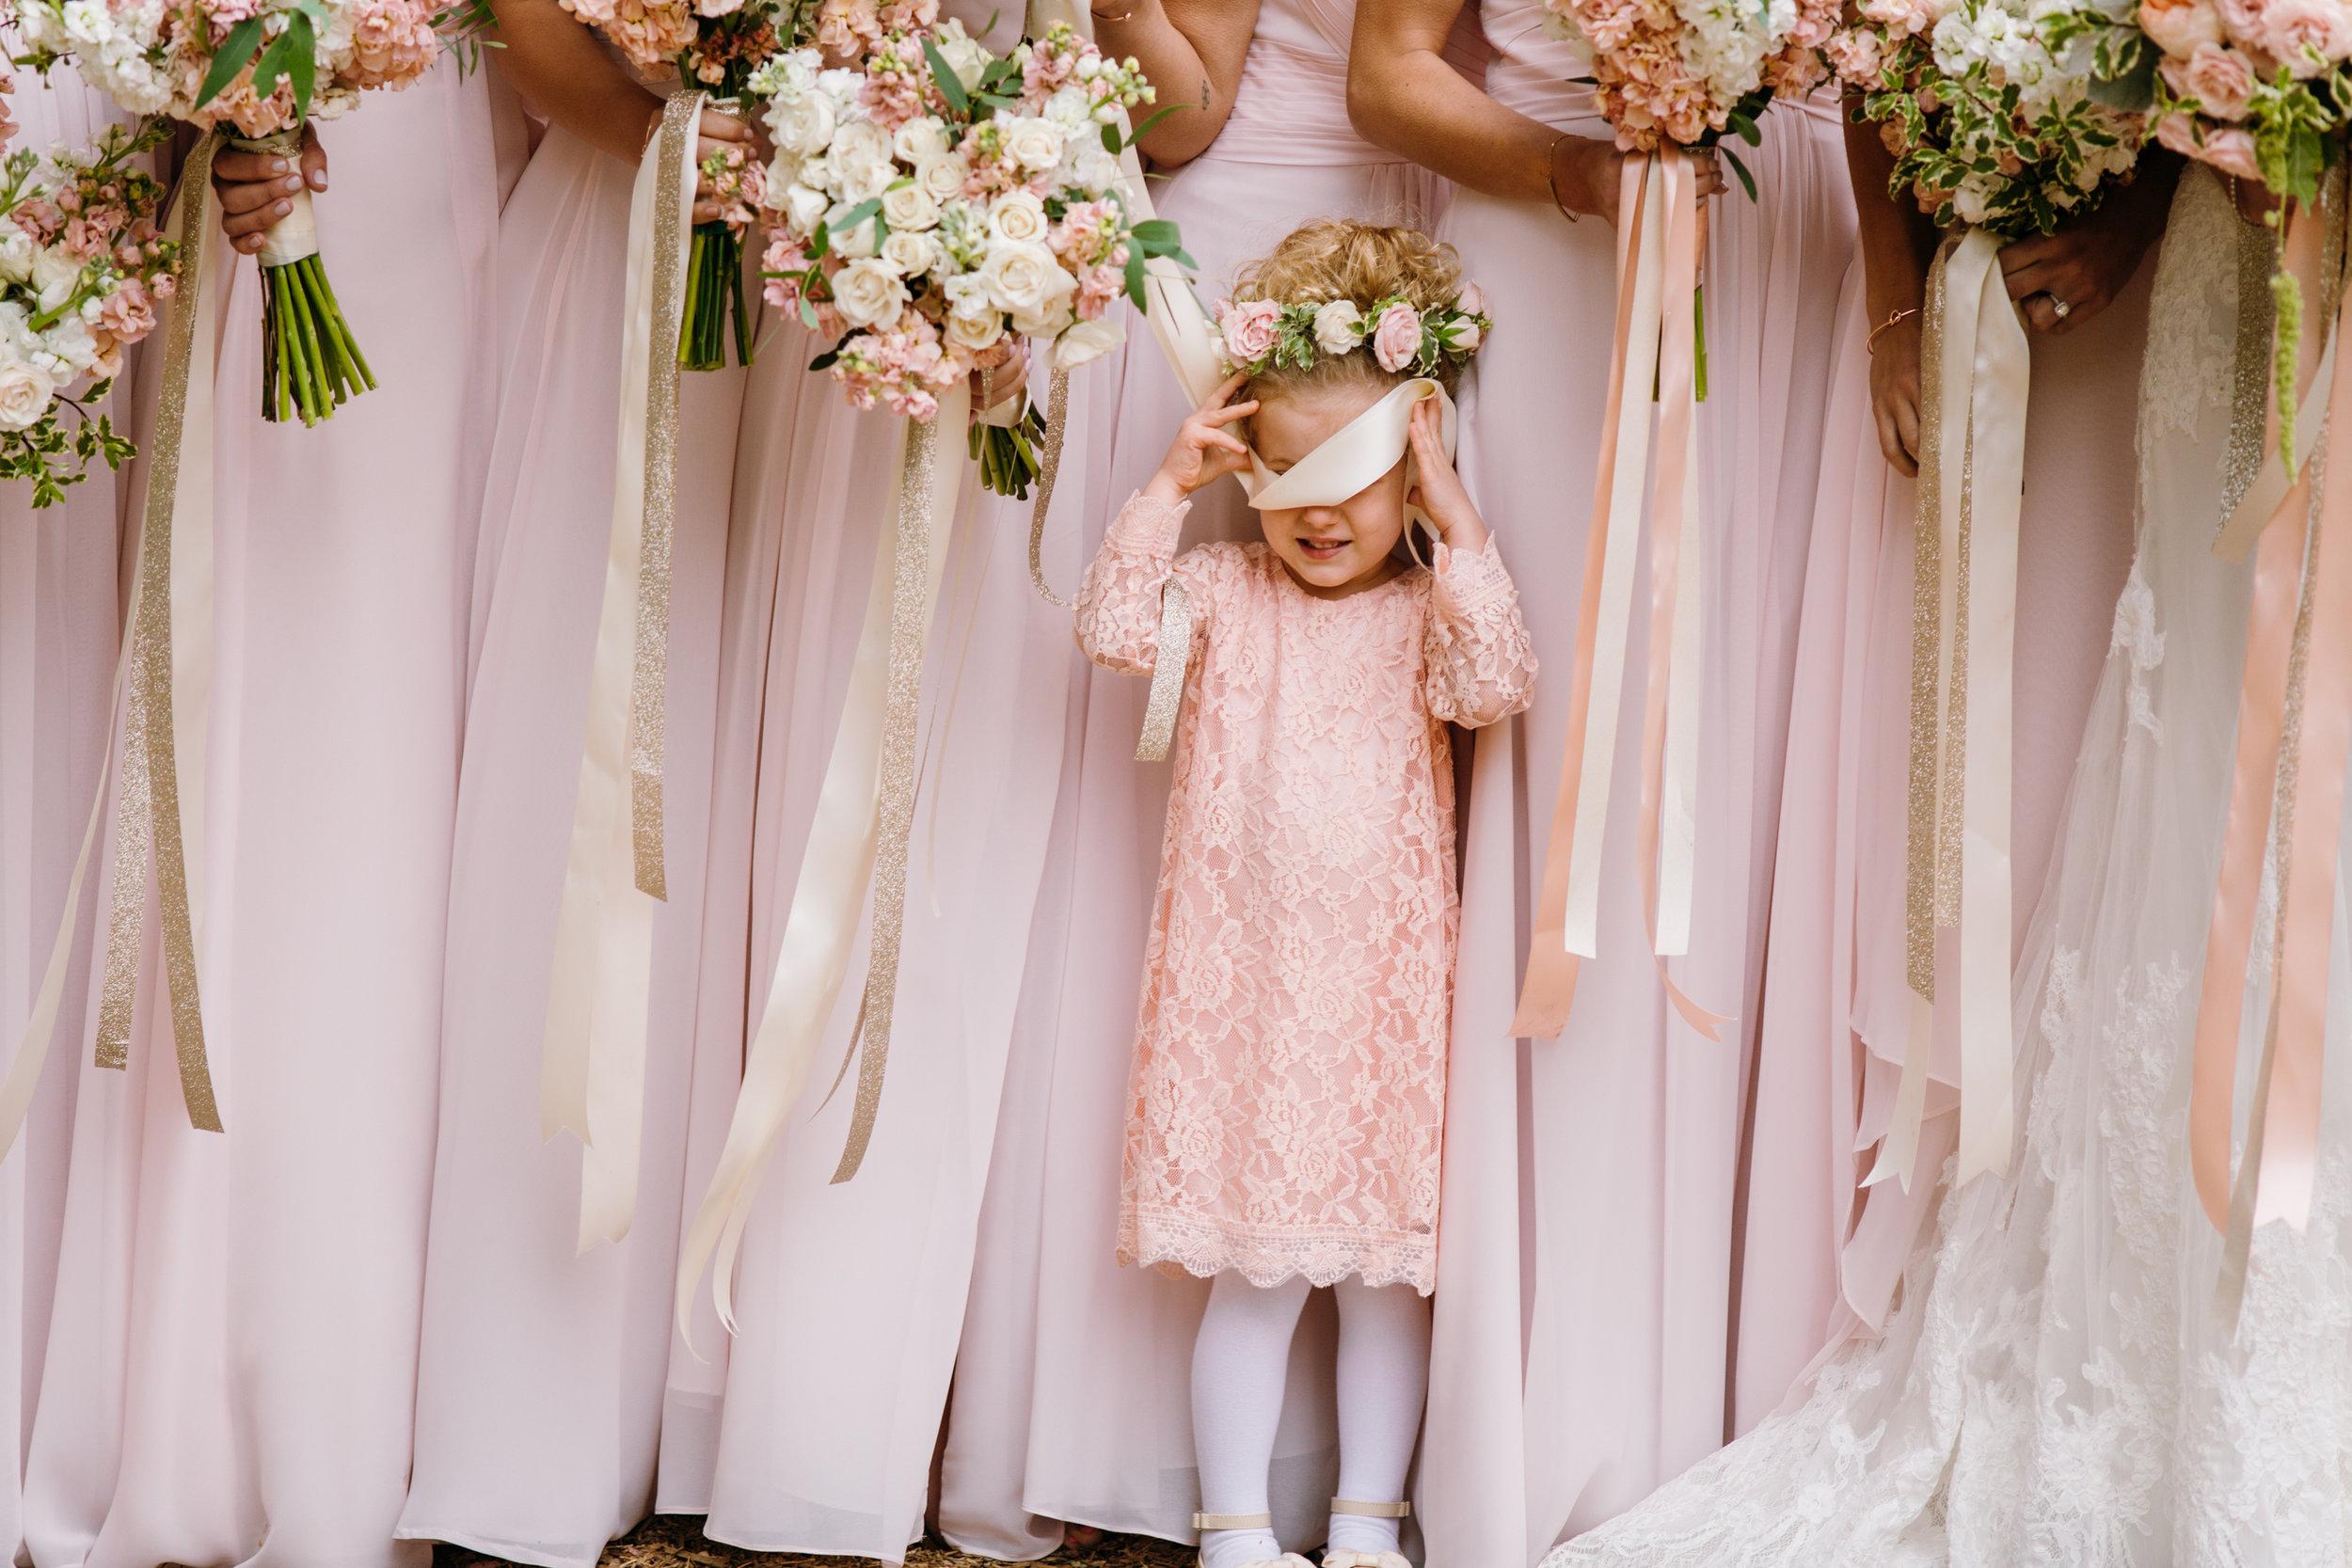 KaraNixonWeddings-LakeOakMeadows-Temecula-Wedding-21.jpg